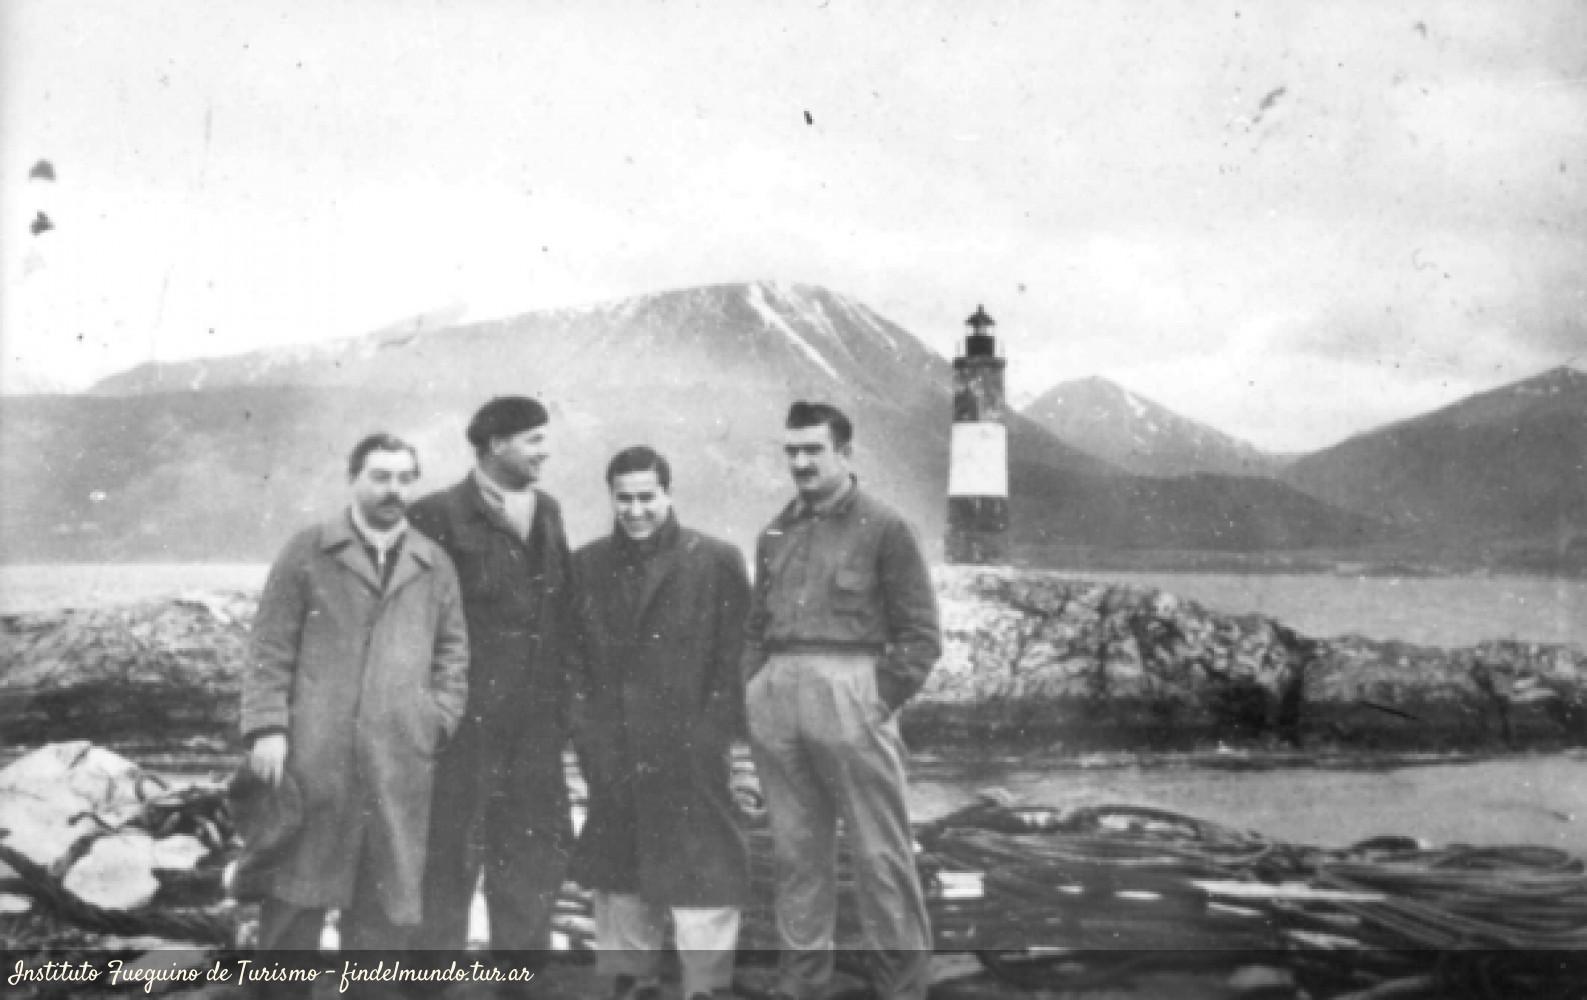 Foto histórica del Faro Les Eclaireurs